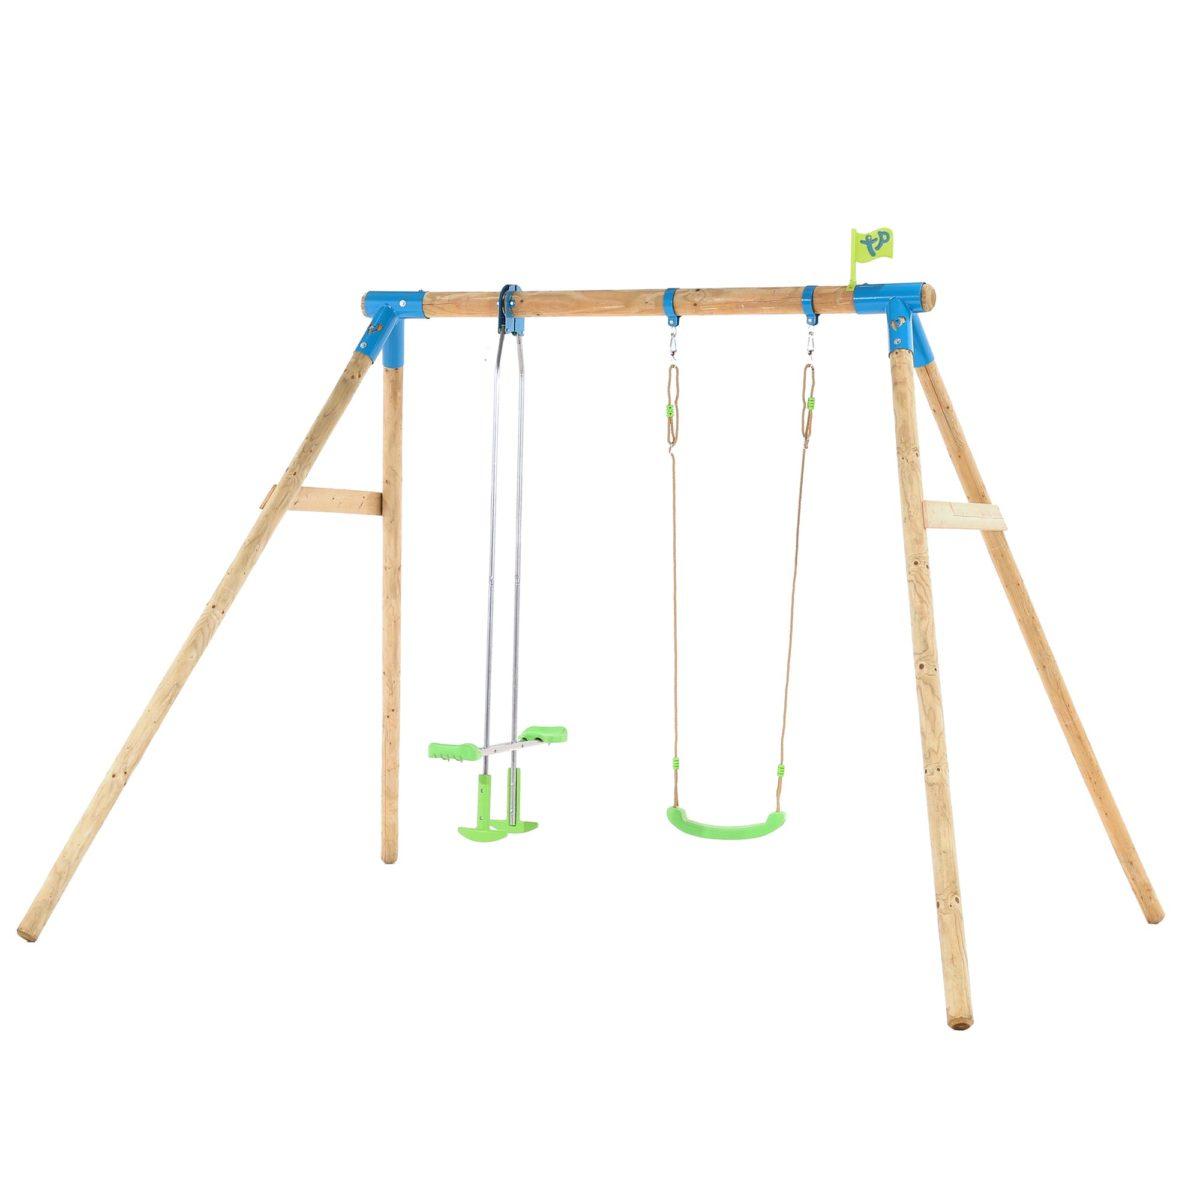 Tp Nagano Wooden Double Swing Set-fsc?